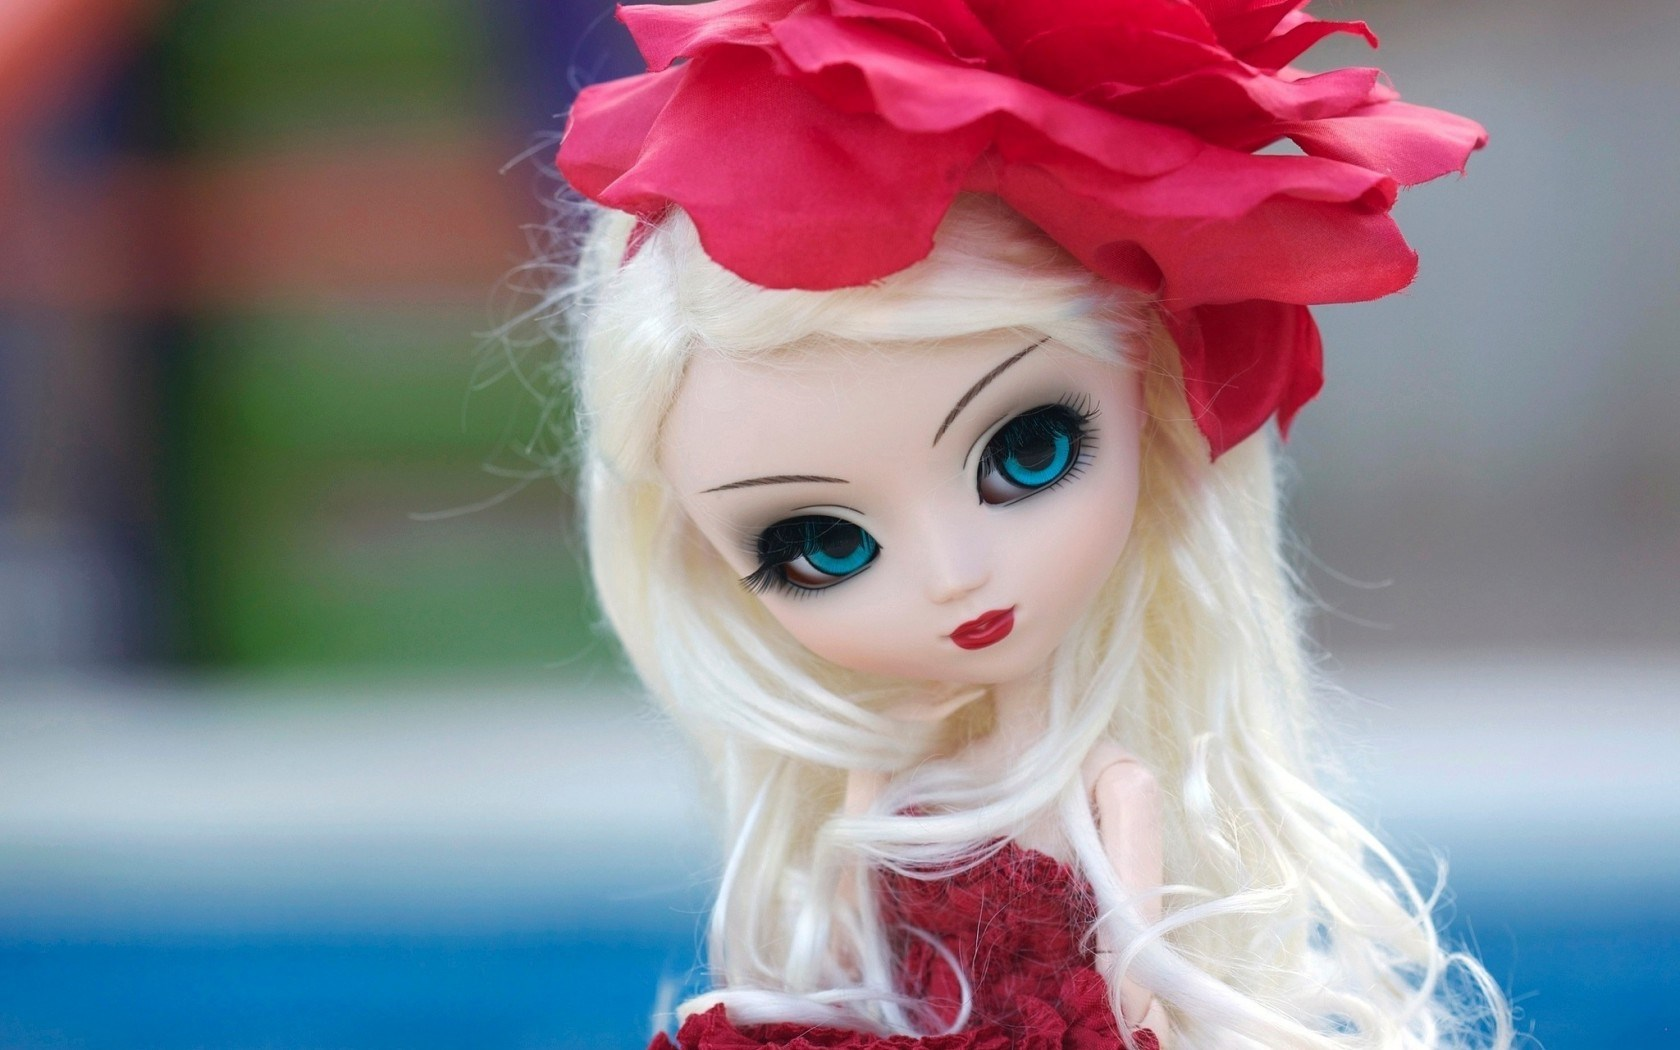 Beautiful Toy Doll Wallpaper